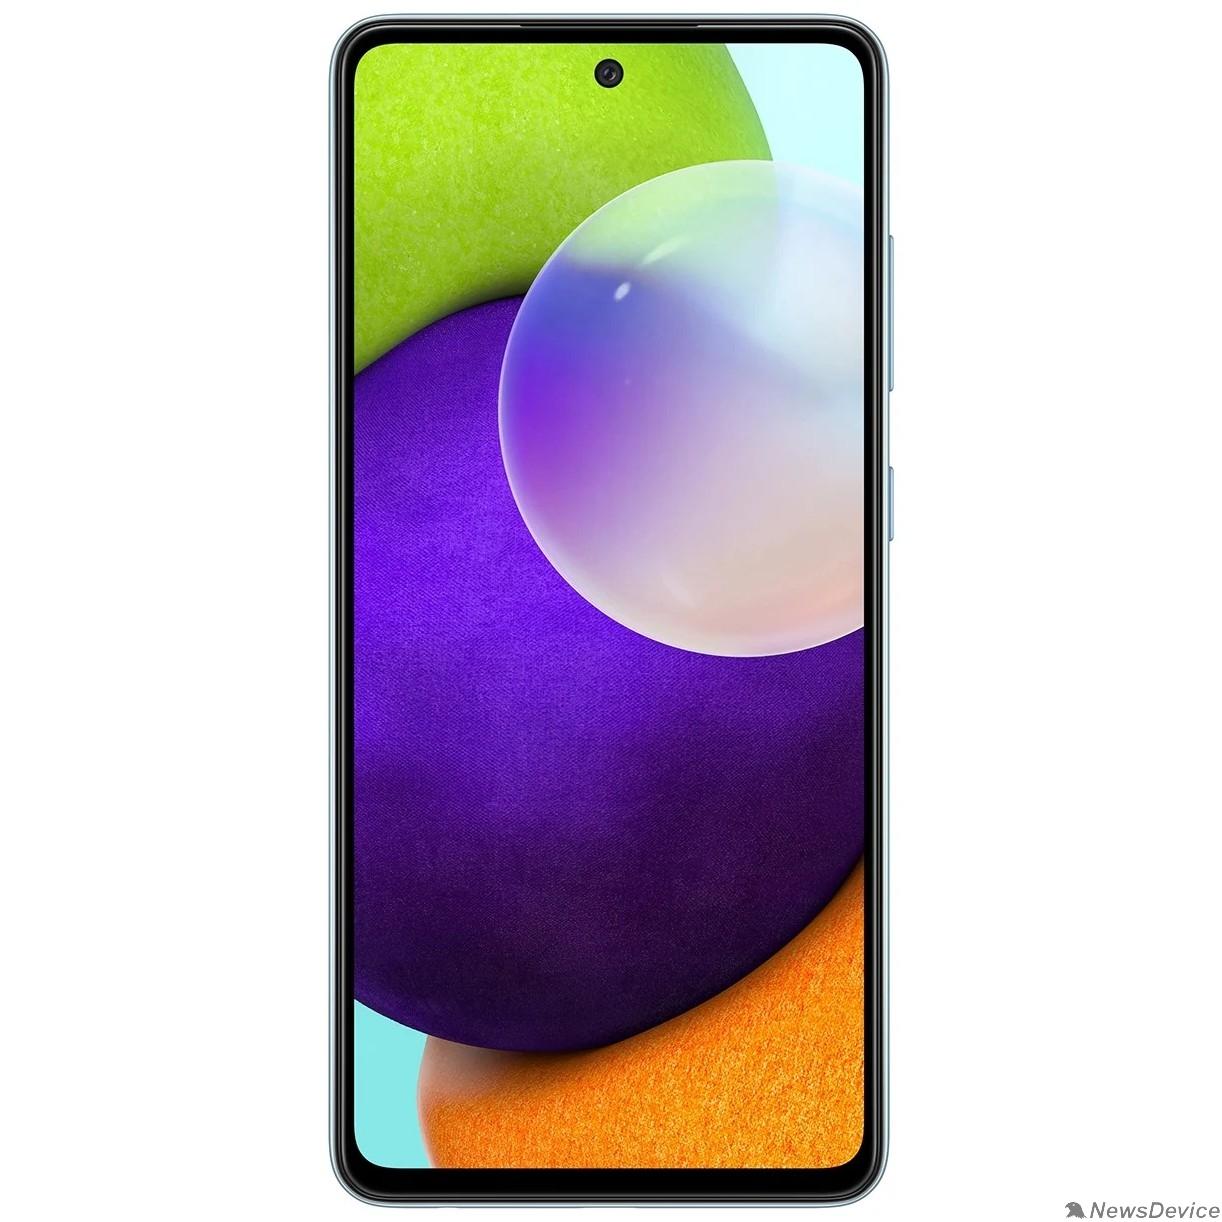 Мобильный телефон Samsung Galaxy A52 (2021) 4/128Gb SM-A525F голубой (SM-A525FZBDSER)